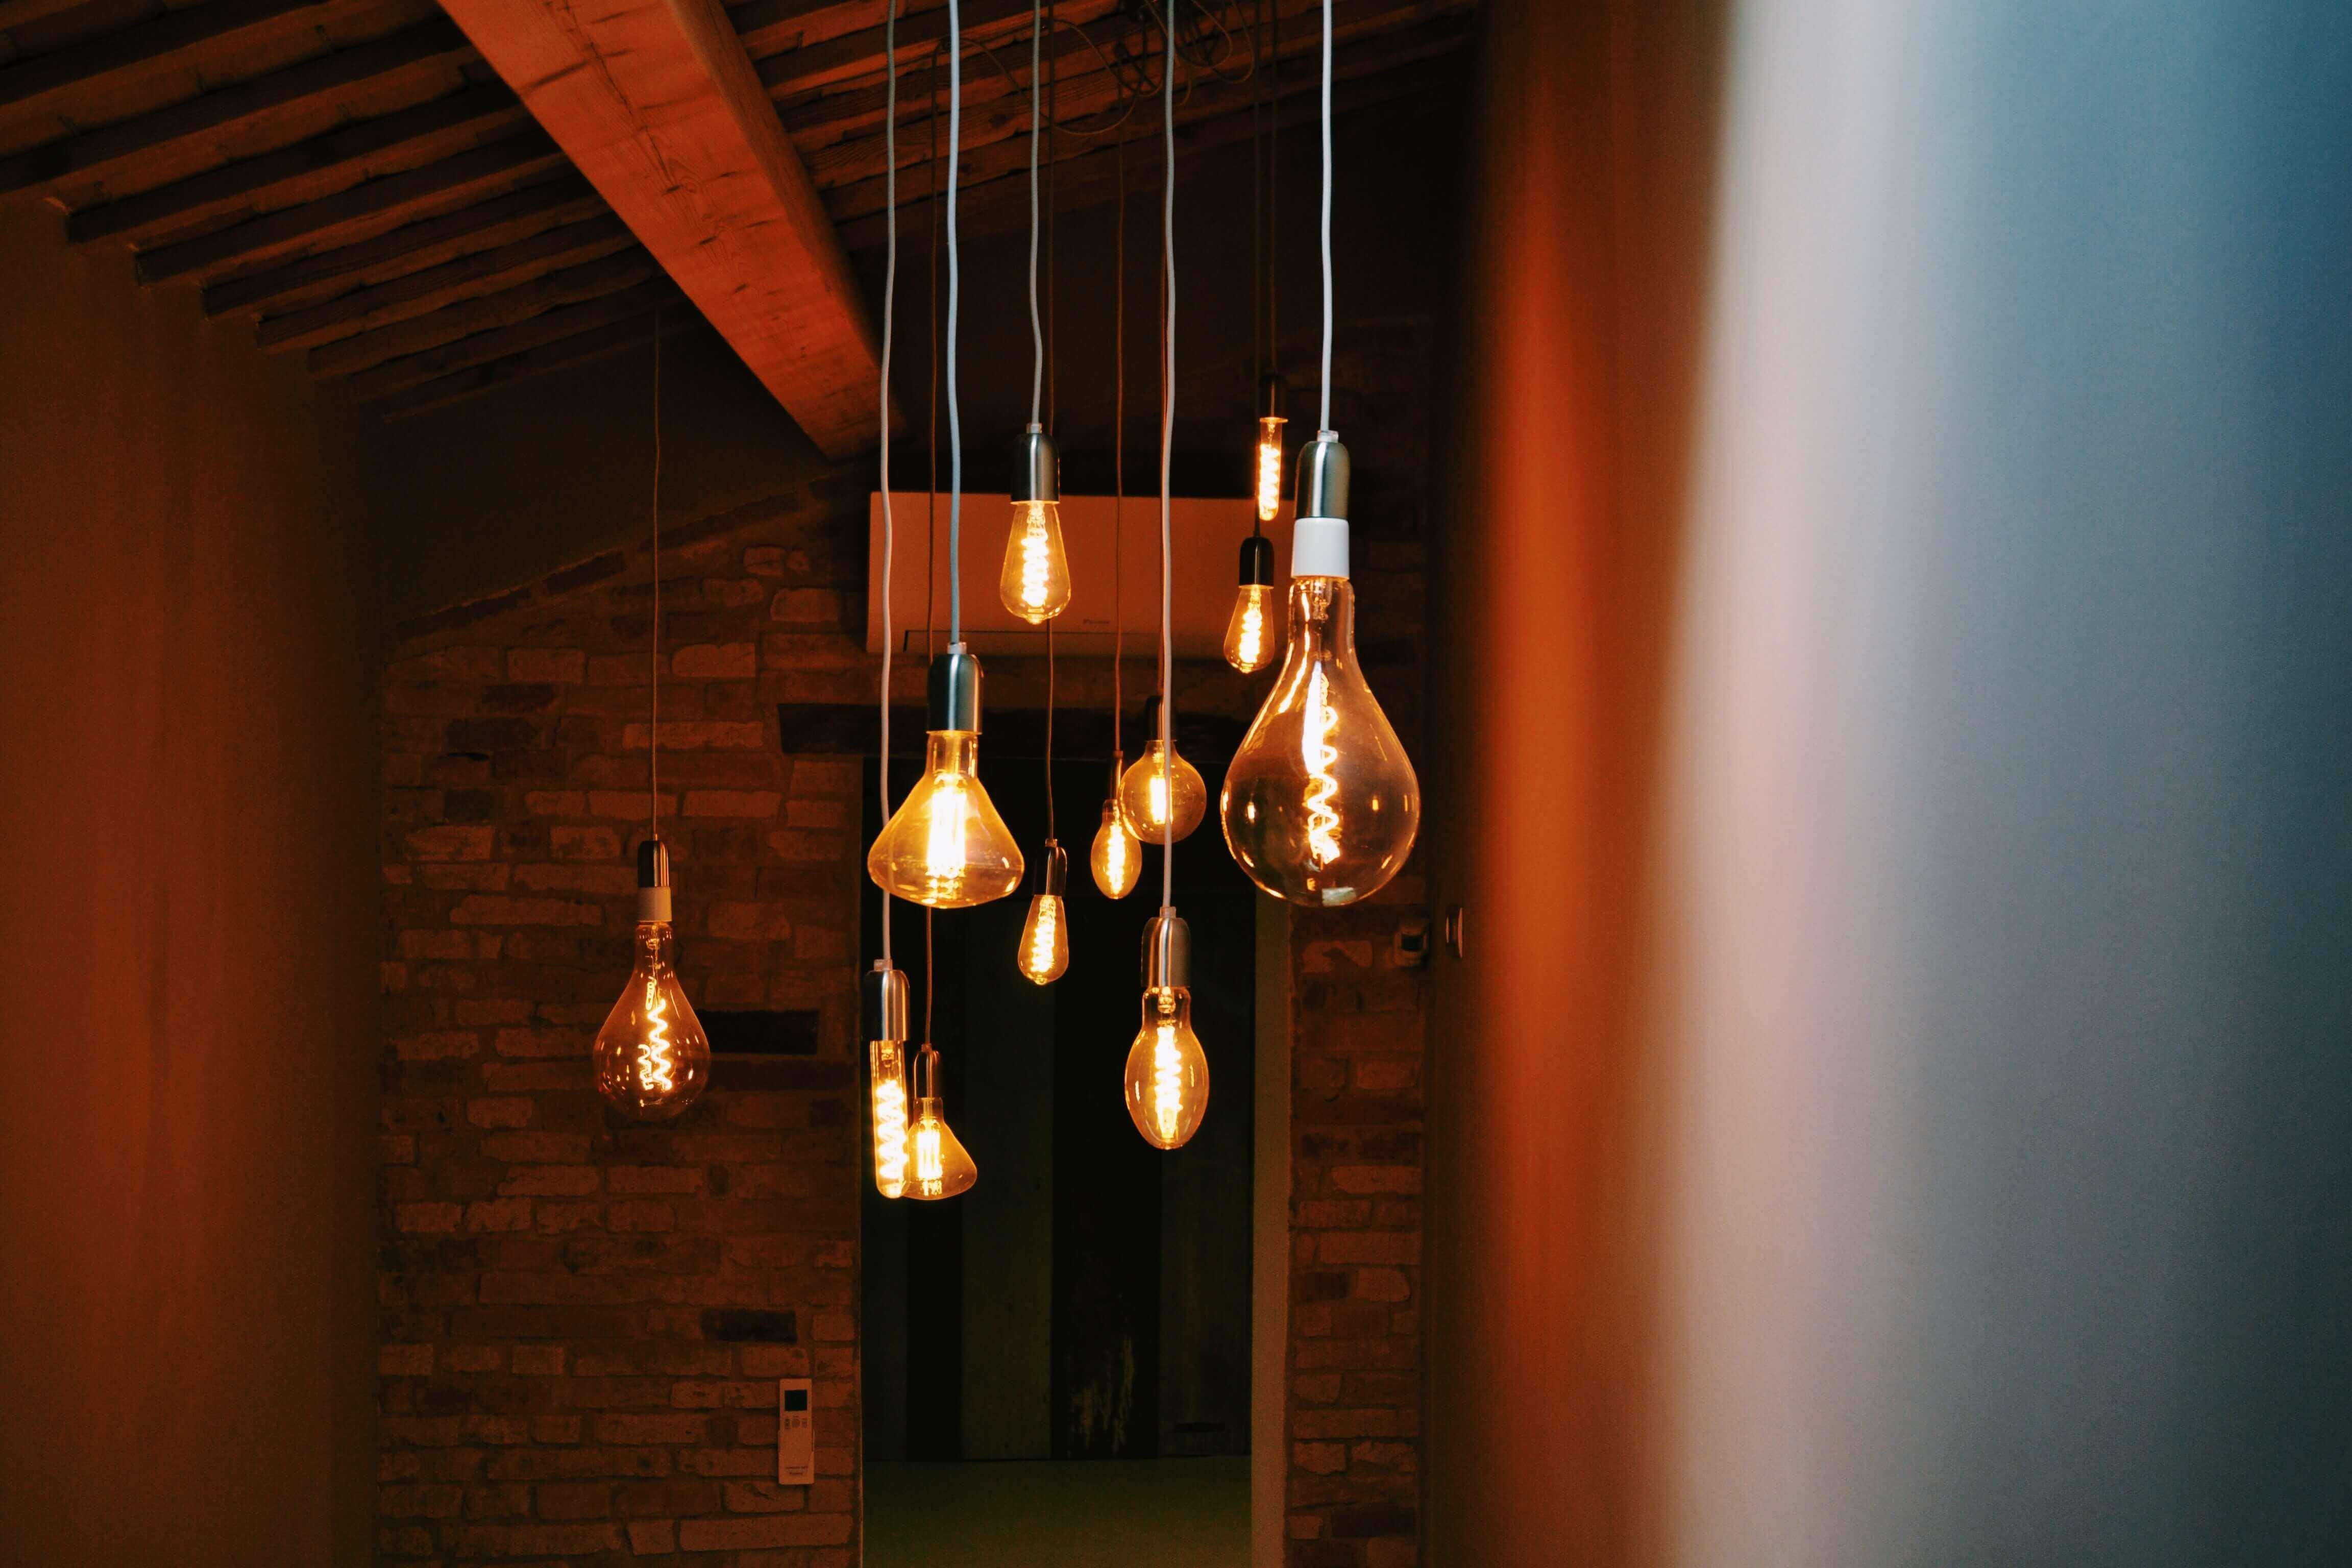 Interior Lighting Design 2020 Golden Trends